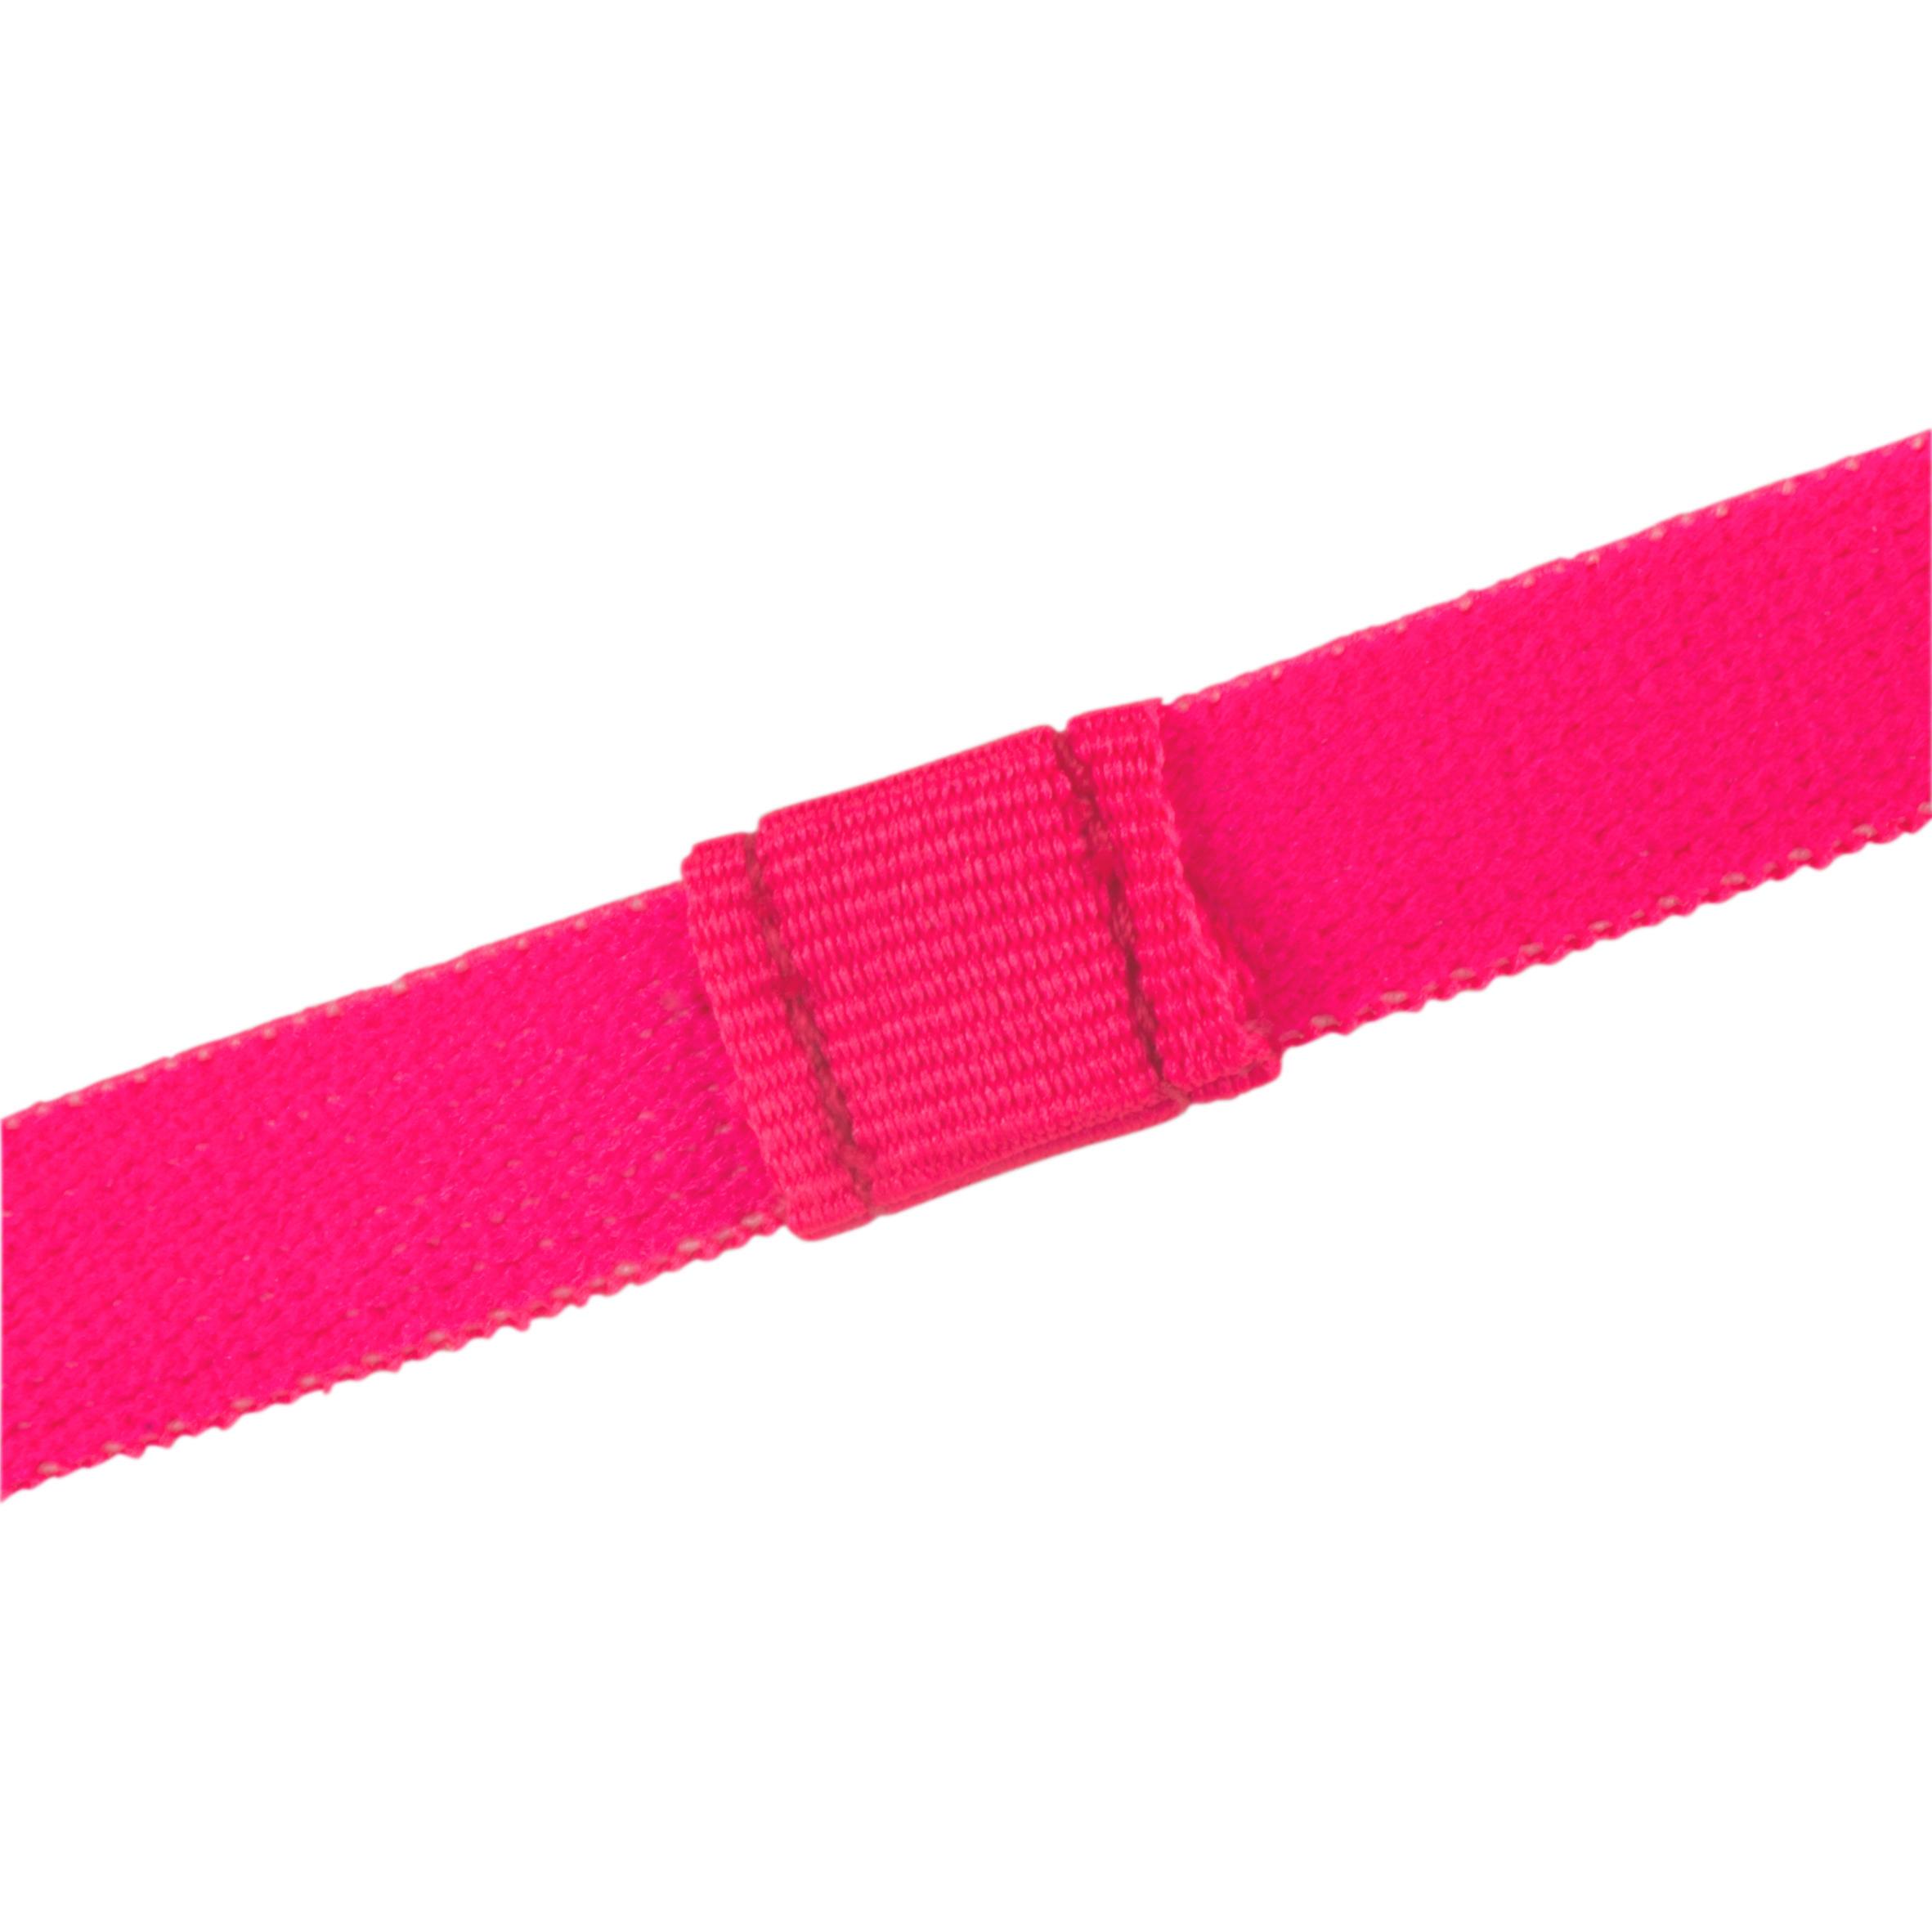 900 Girls' Gym Headbands Tri-Pack - Pink/Black/Blue